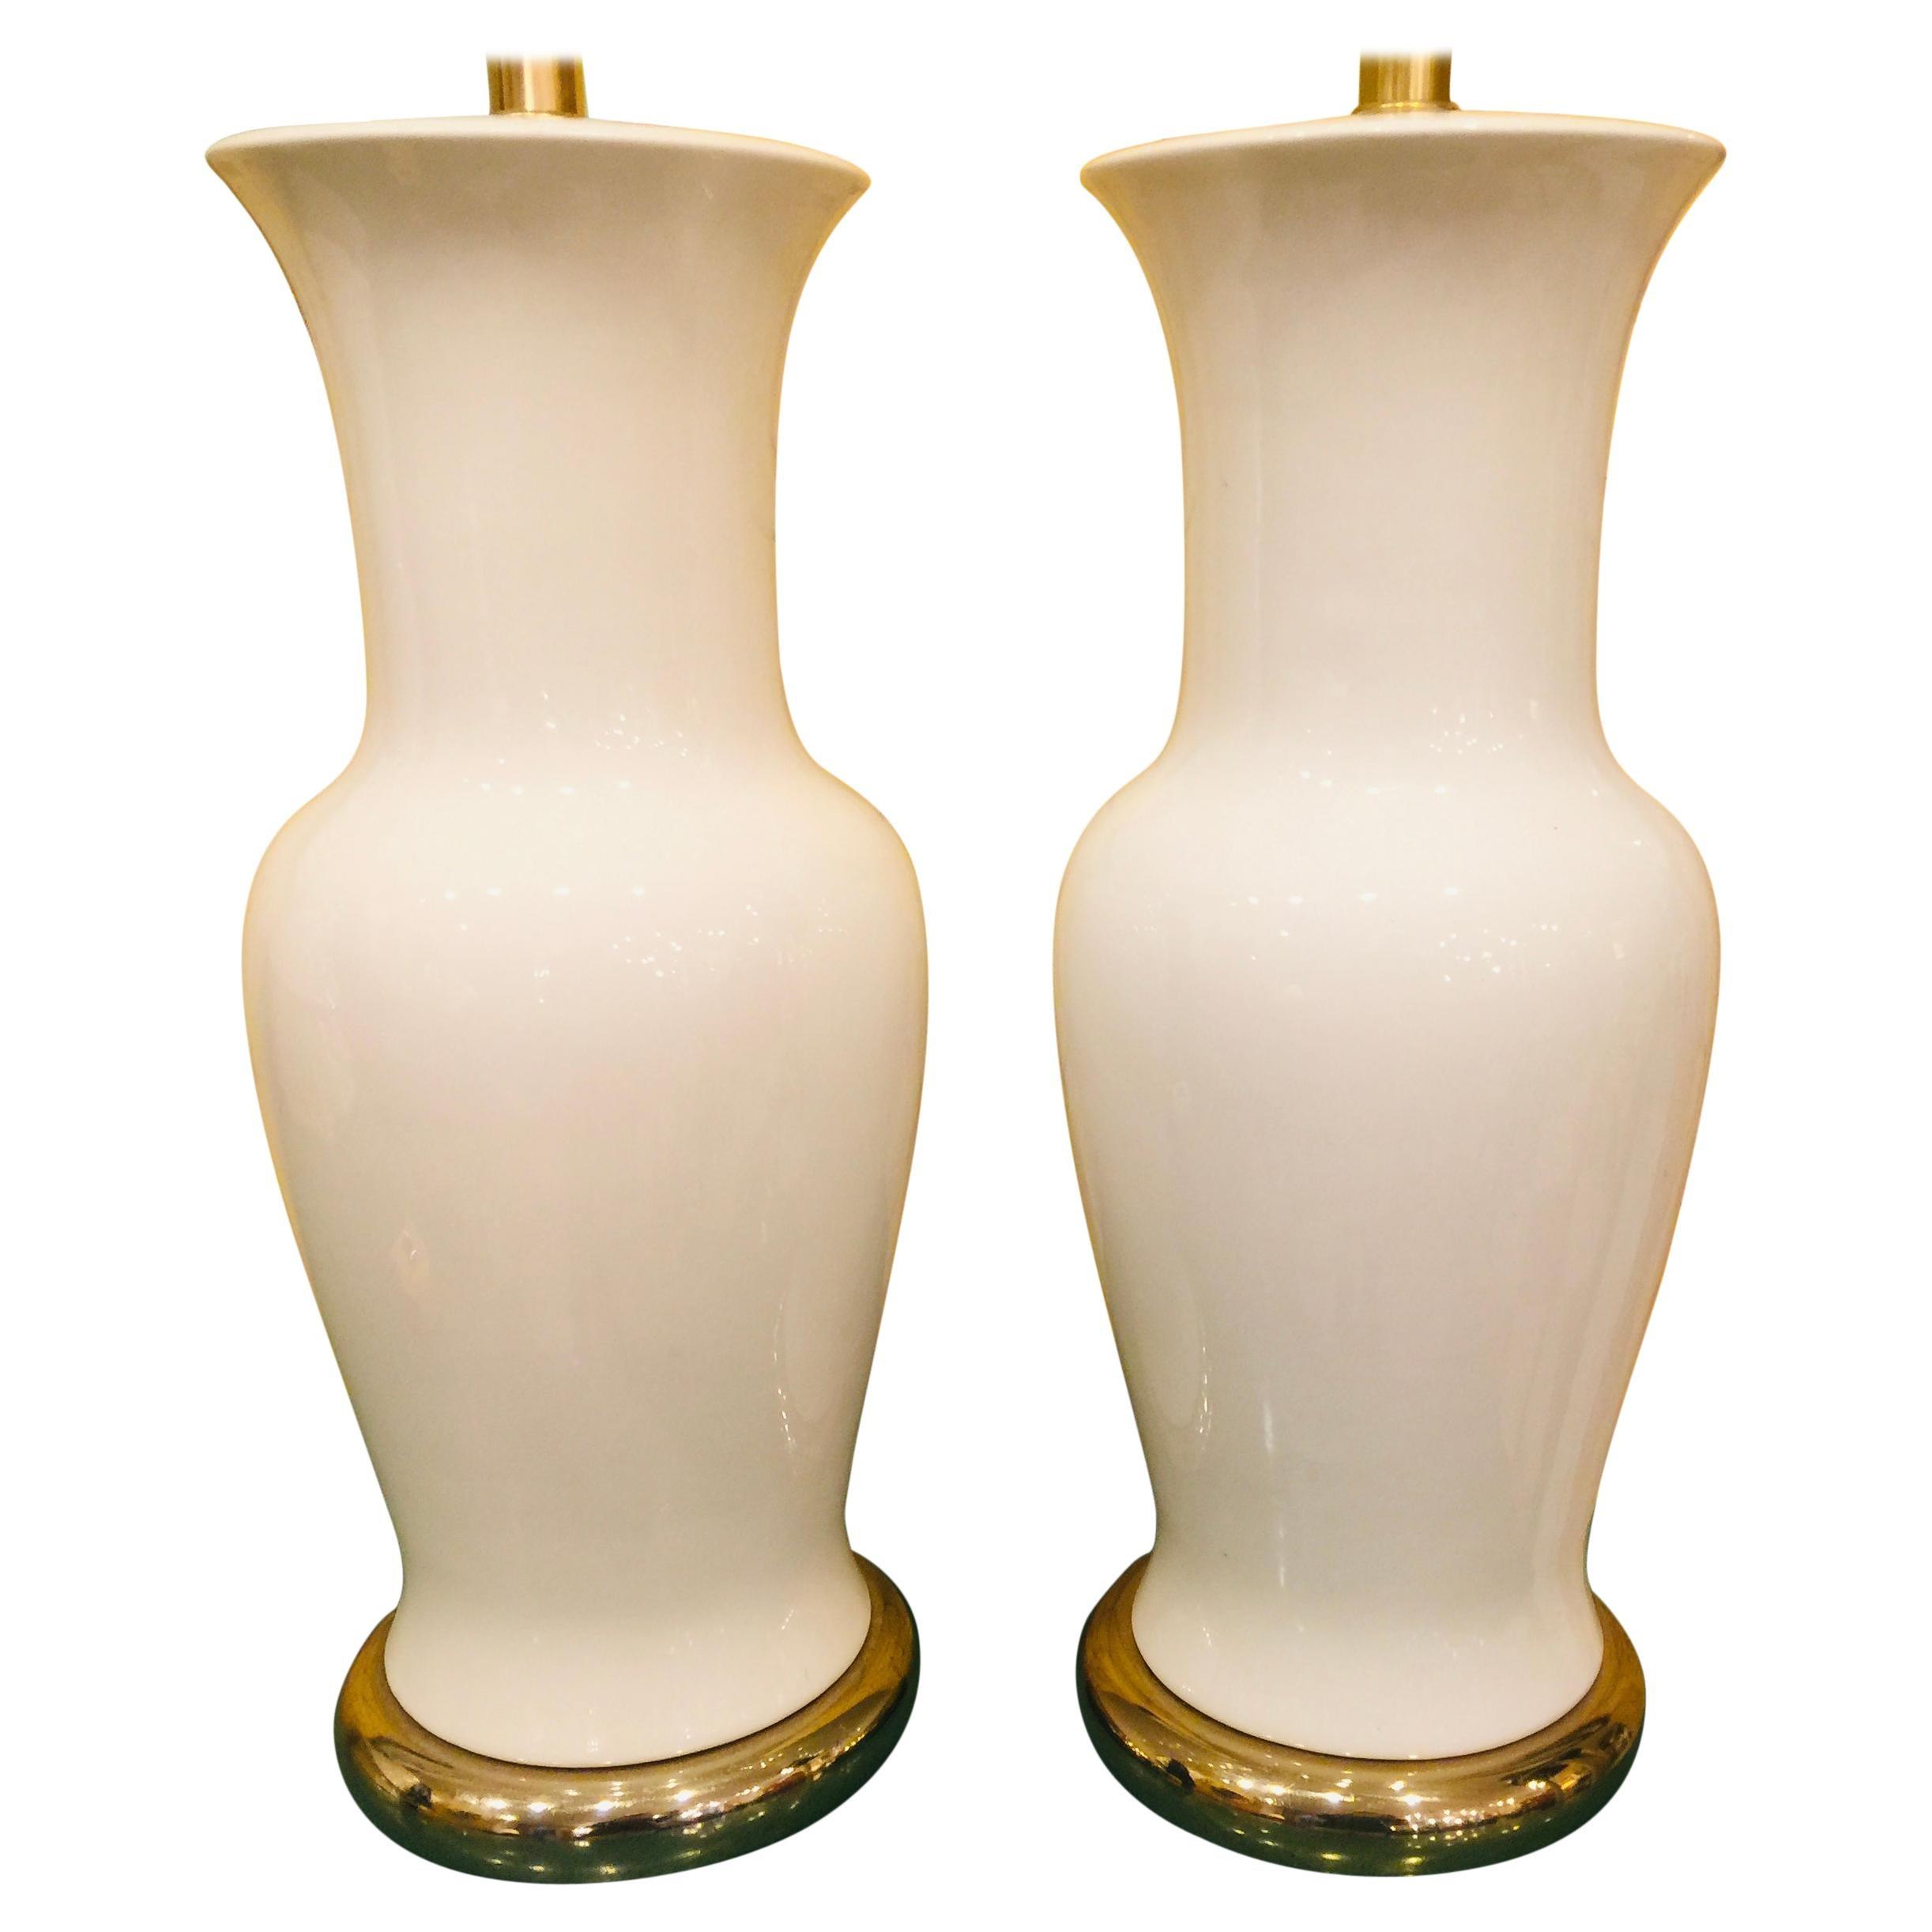 Pair of American White Porcelain Vase Lamps